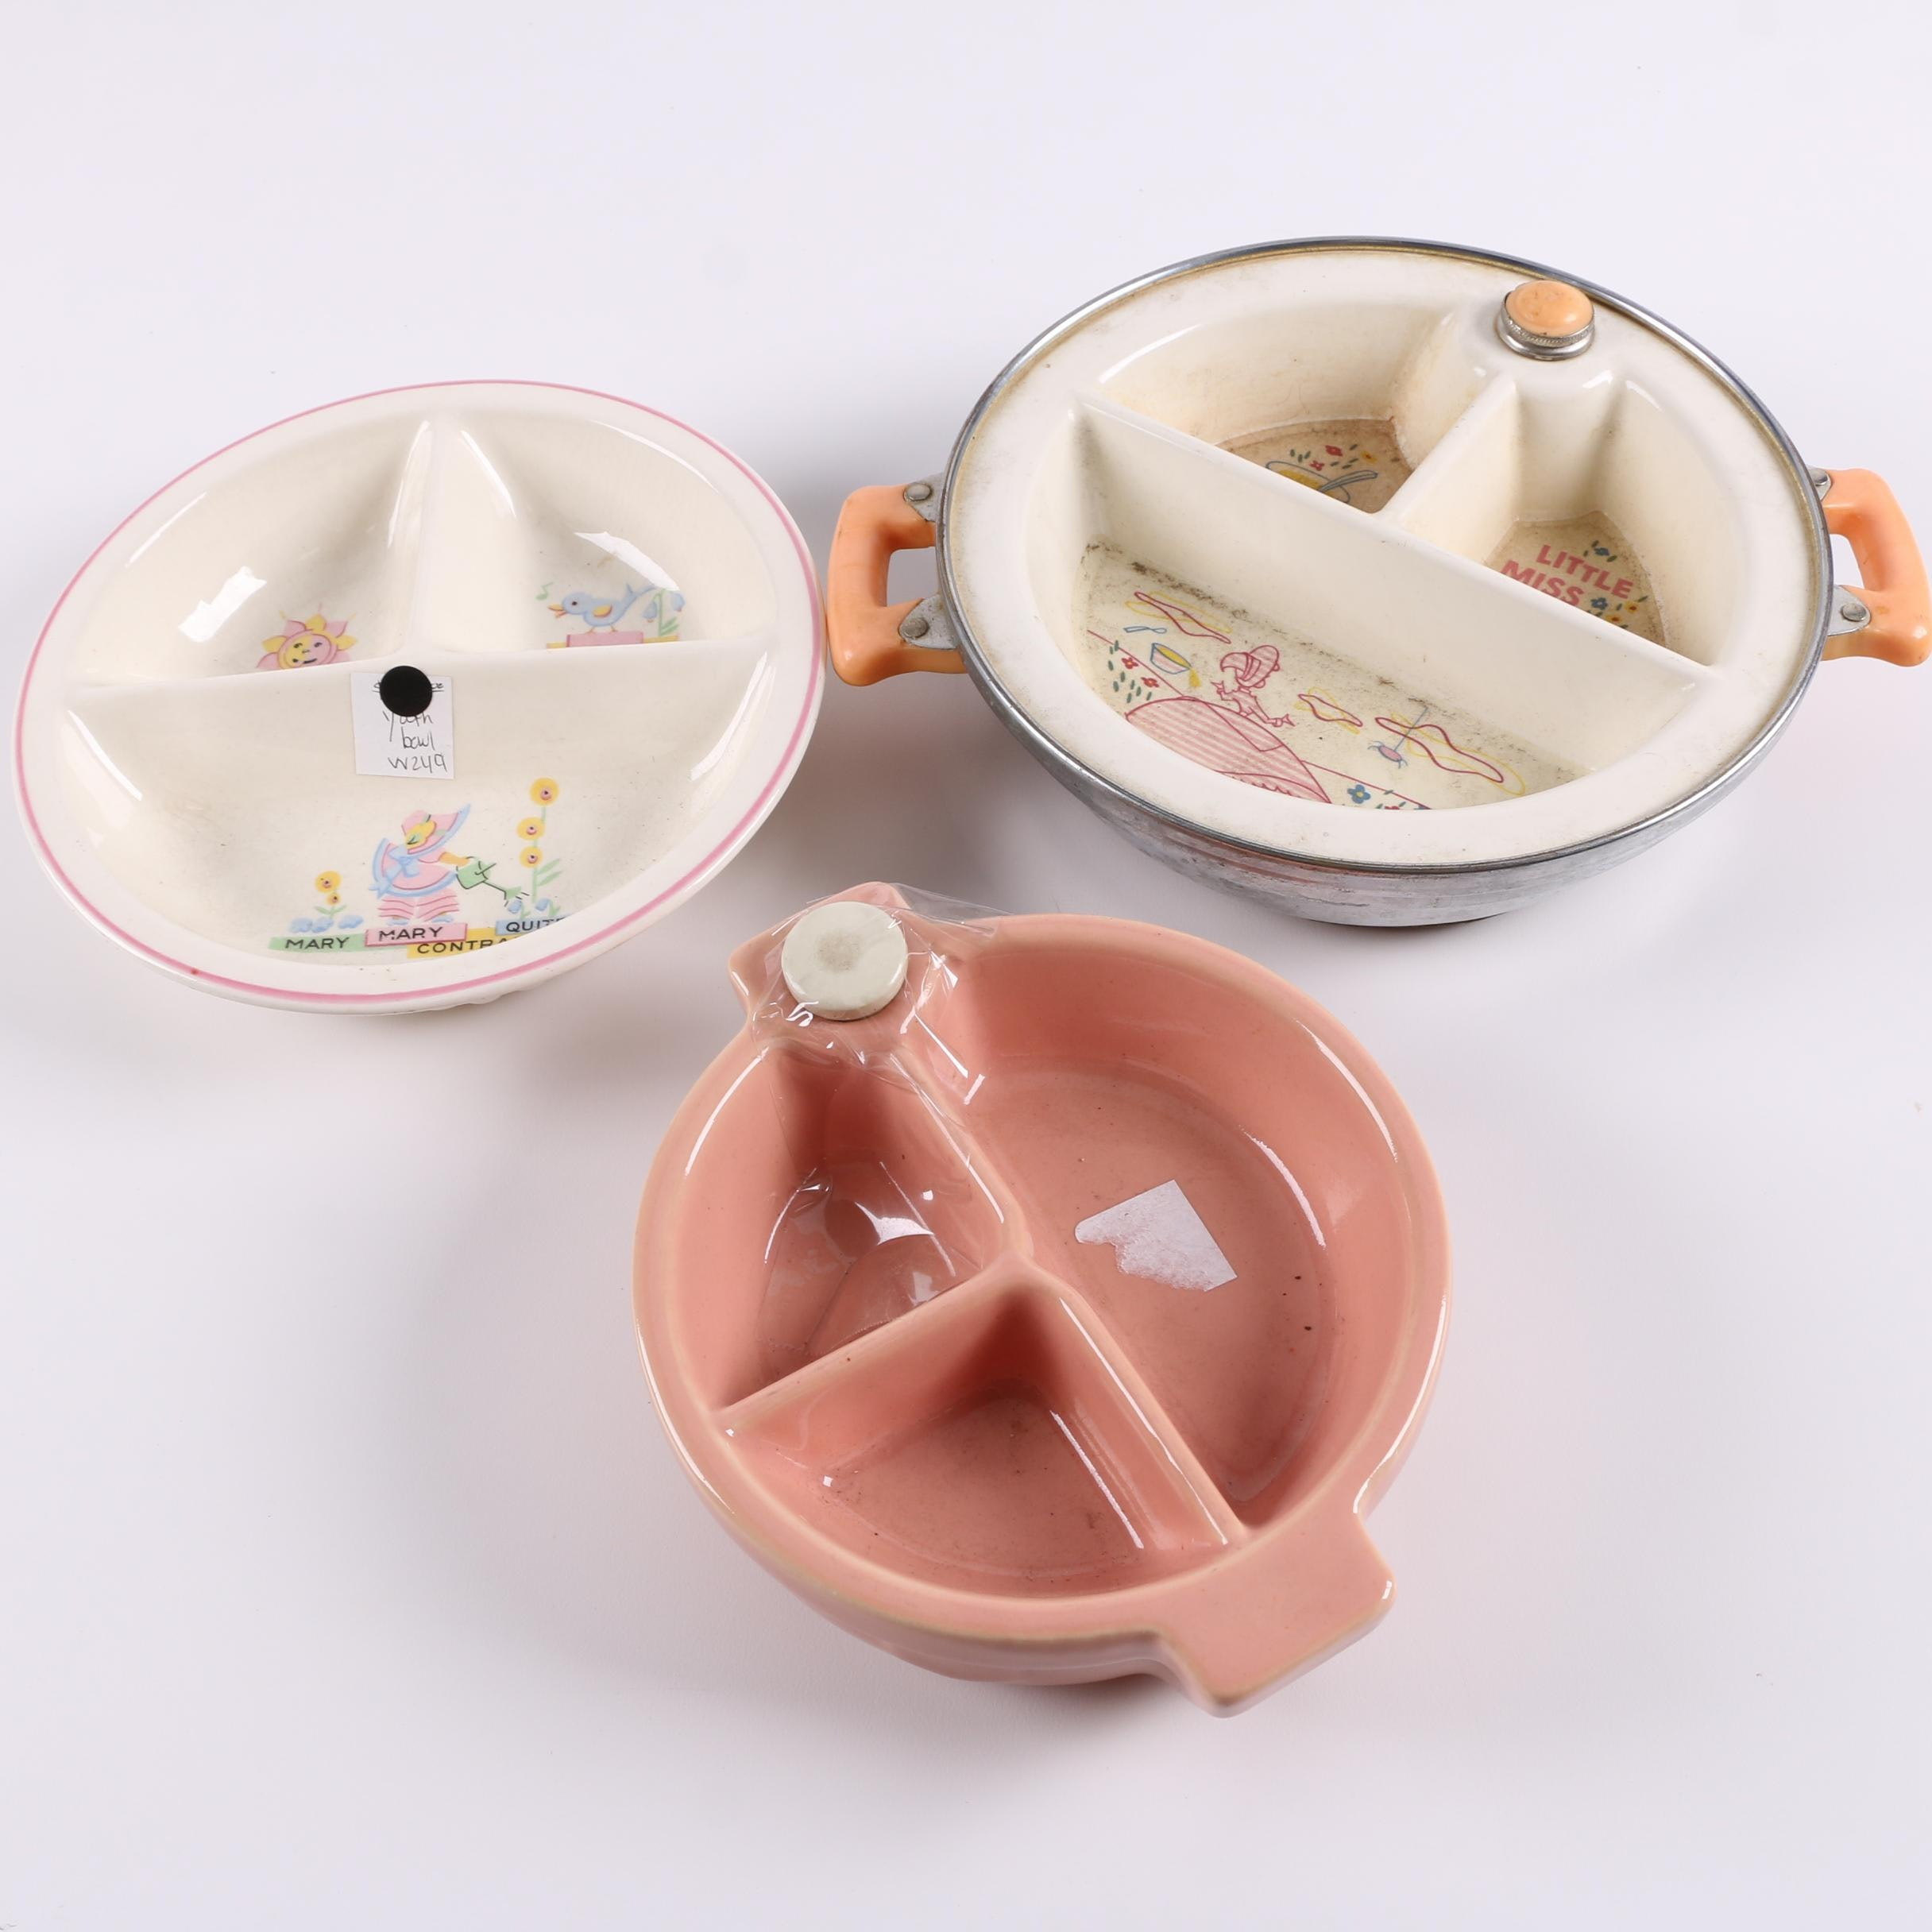 Vintage Children's Ceramic Bowls Including Excello Warming Bowl